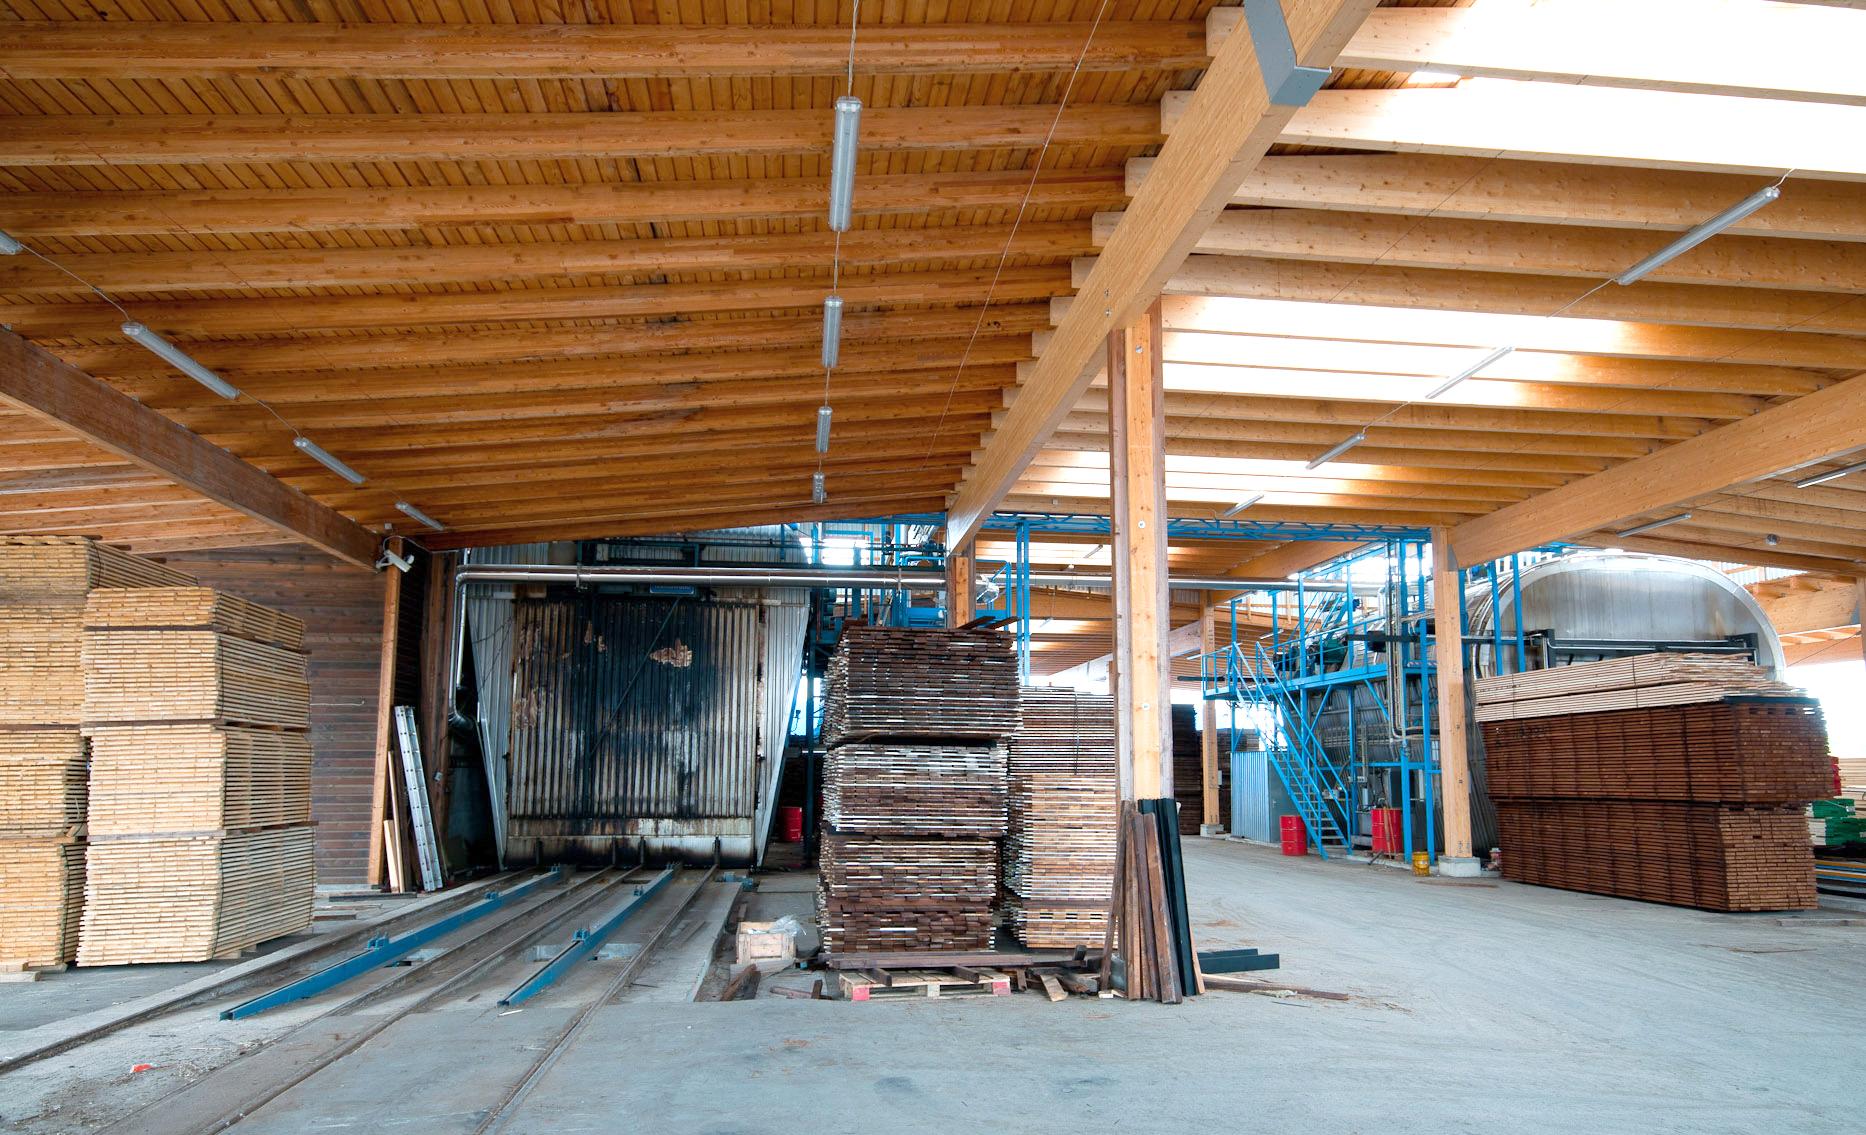 turkel_design_modern_prefab_home_axiomdeserthouse_manufacturing.jpg